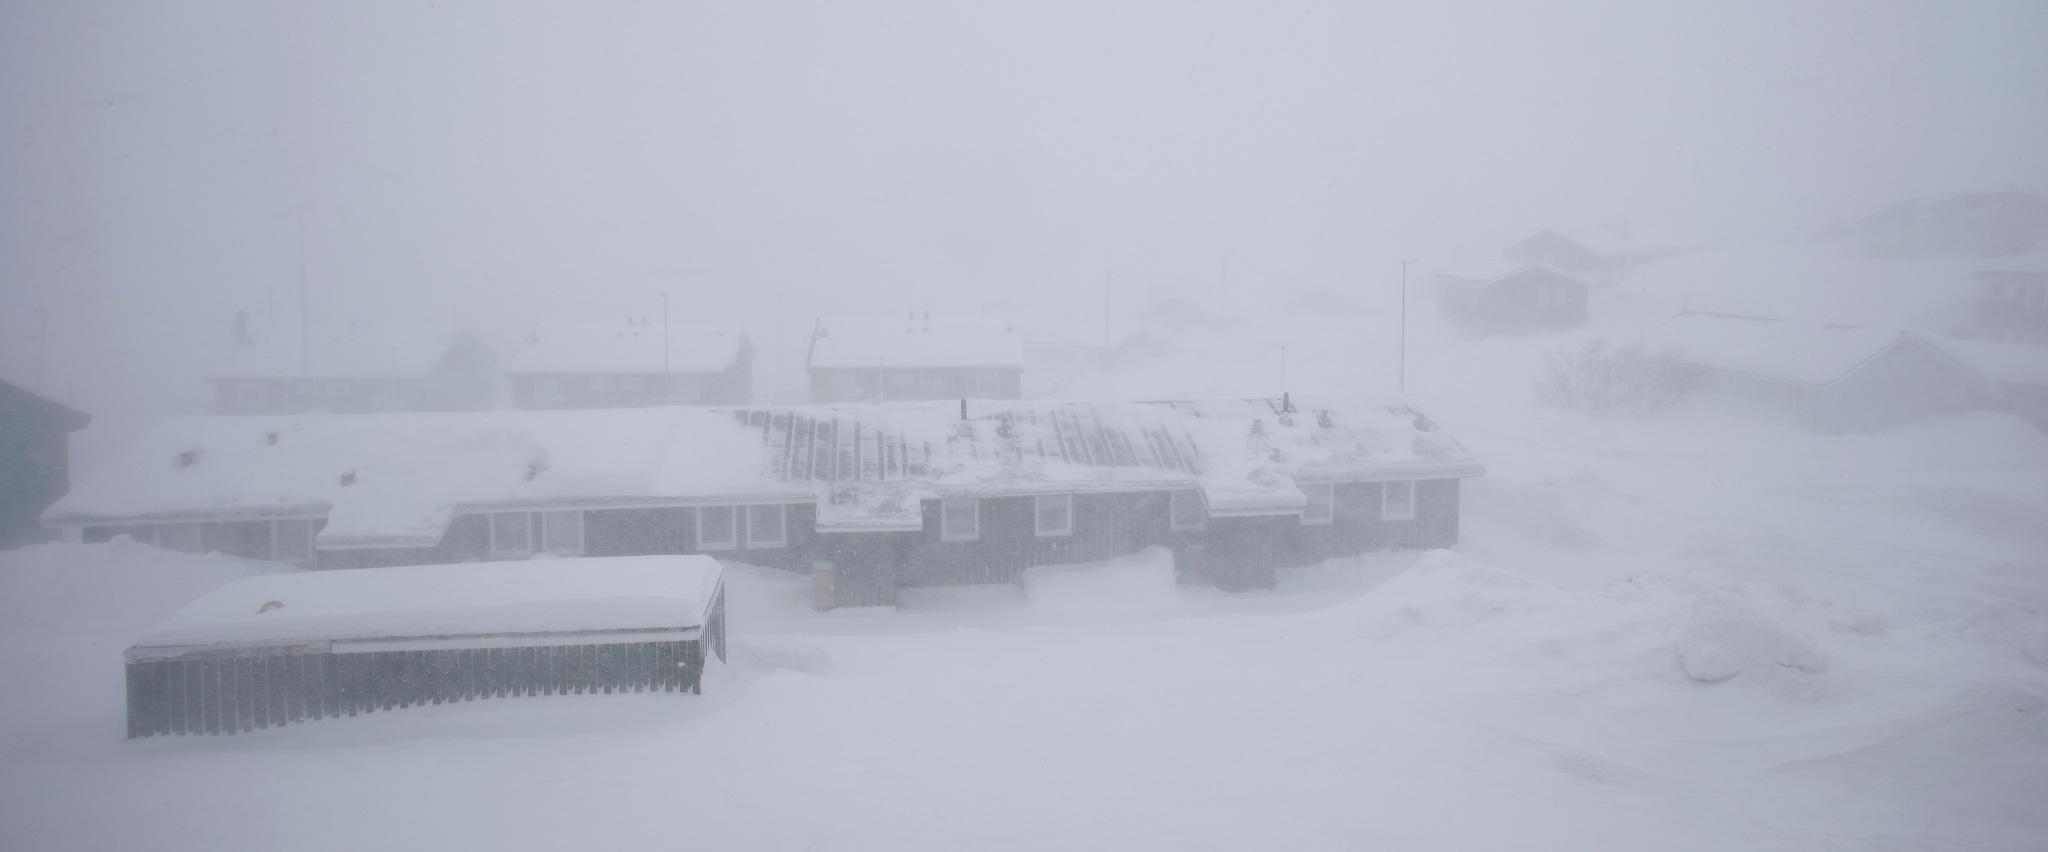 blizzard nuuk 18 marts by Tom Augo Lynge